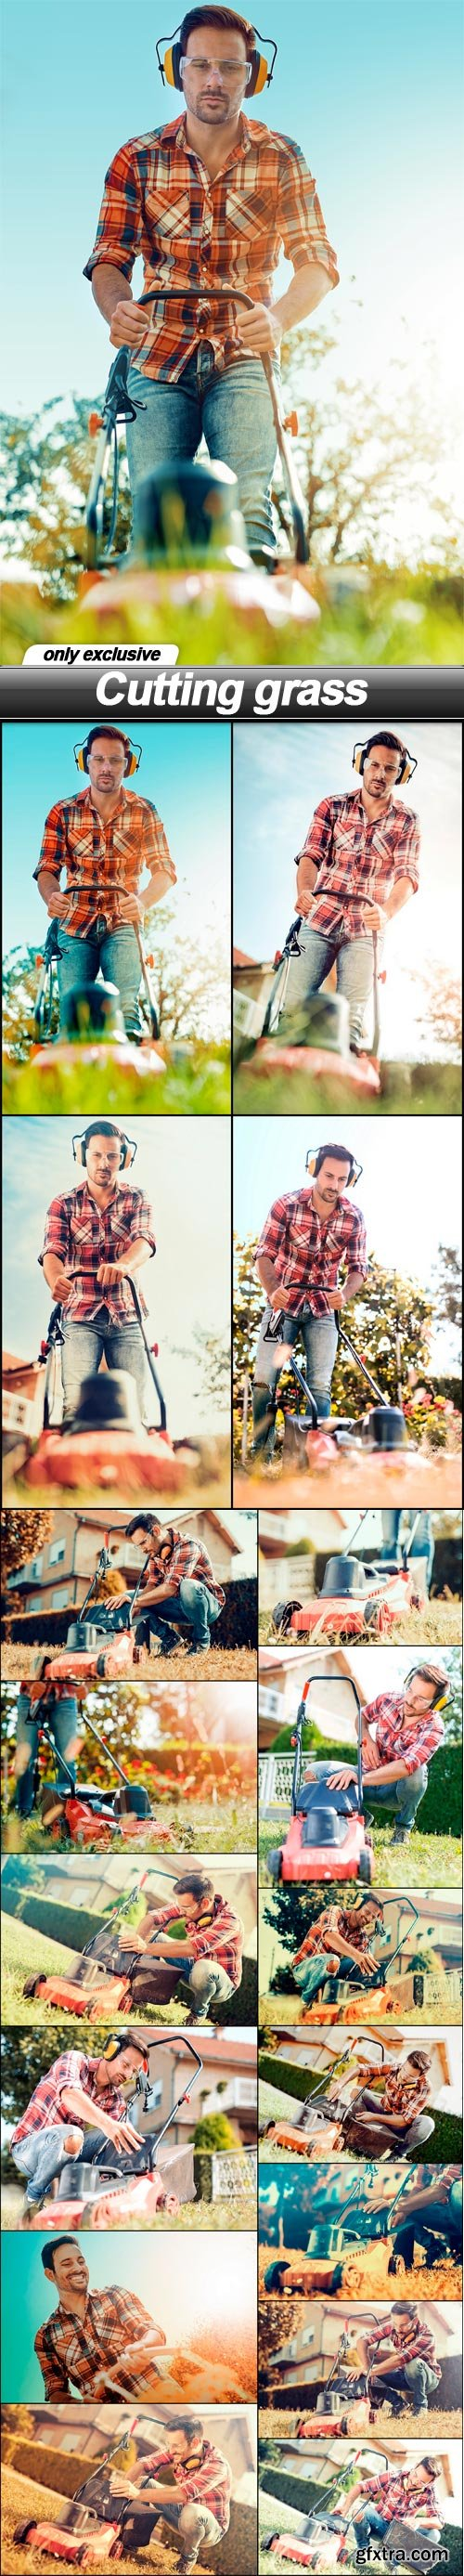 Cutting grass - 17 UHQ JPEG